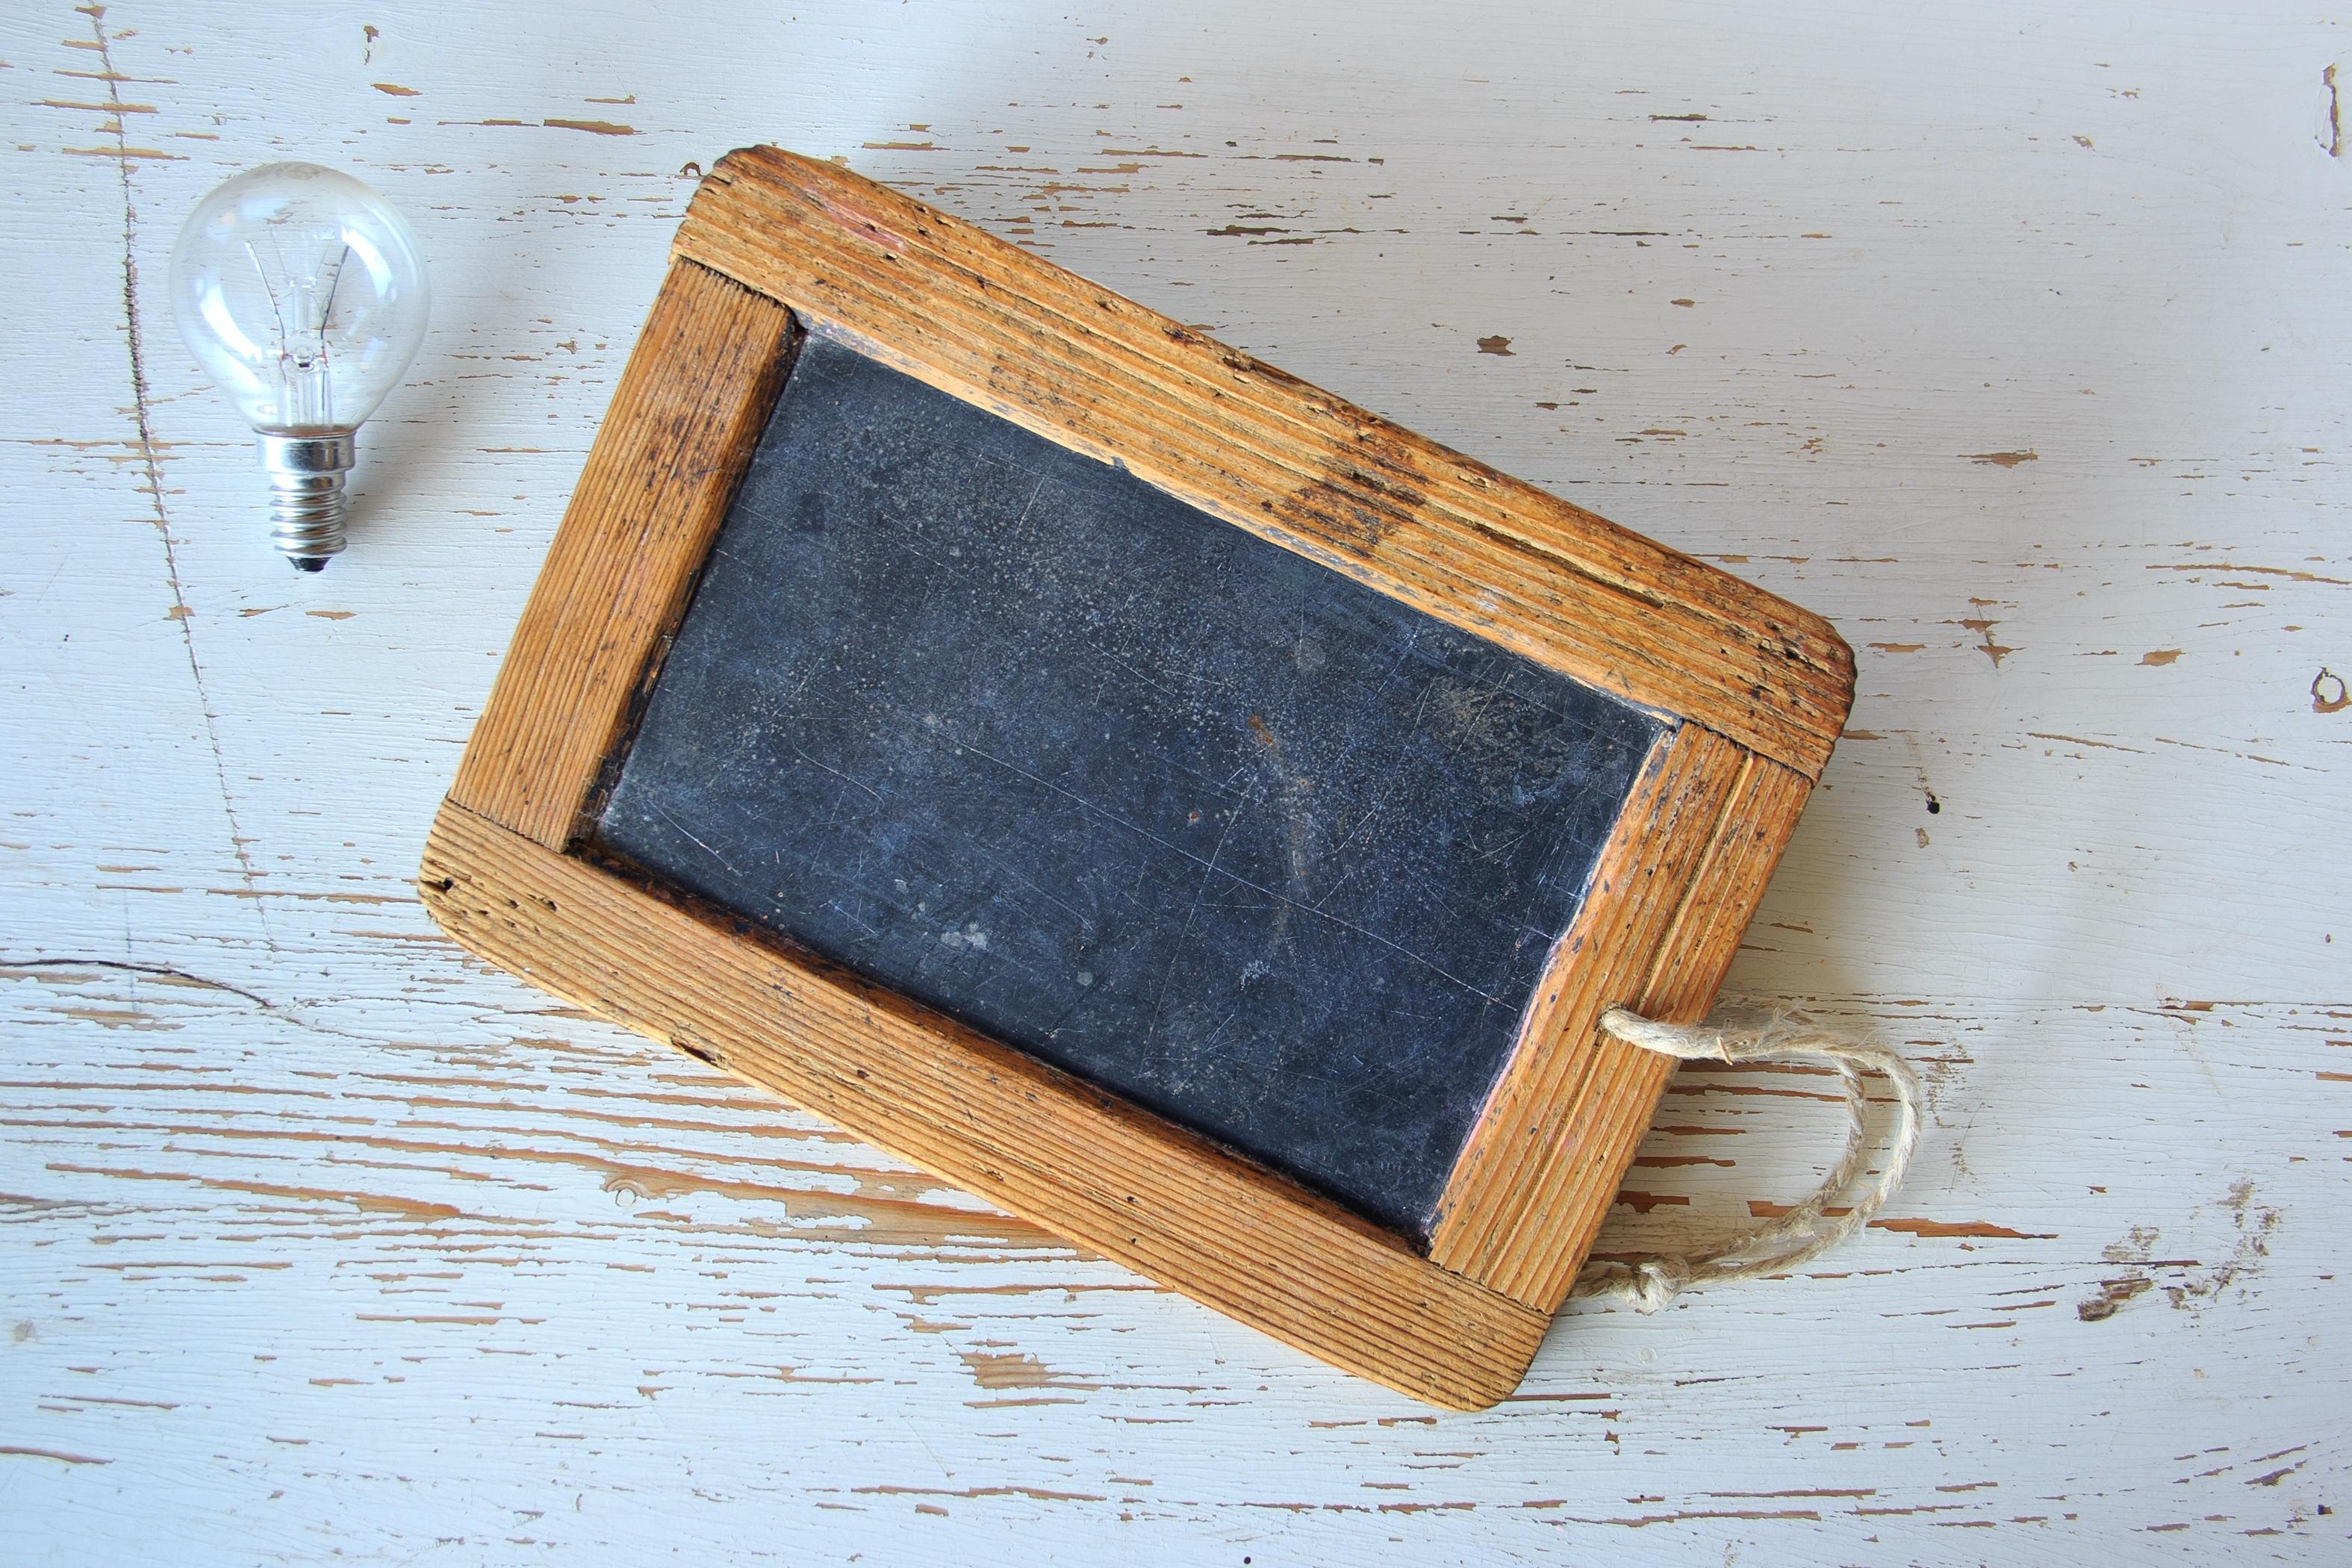 Fotos gratis : leer, ligero, madera, vendimia, antiguo, rústico ...